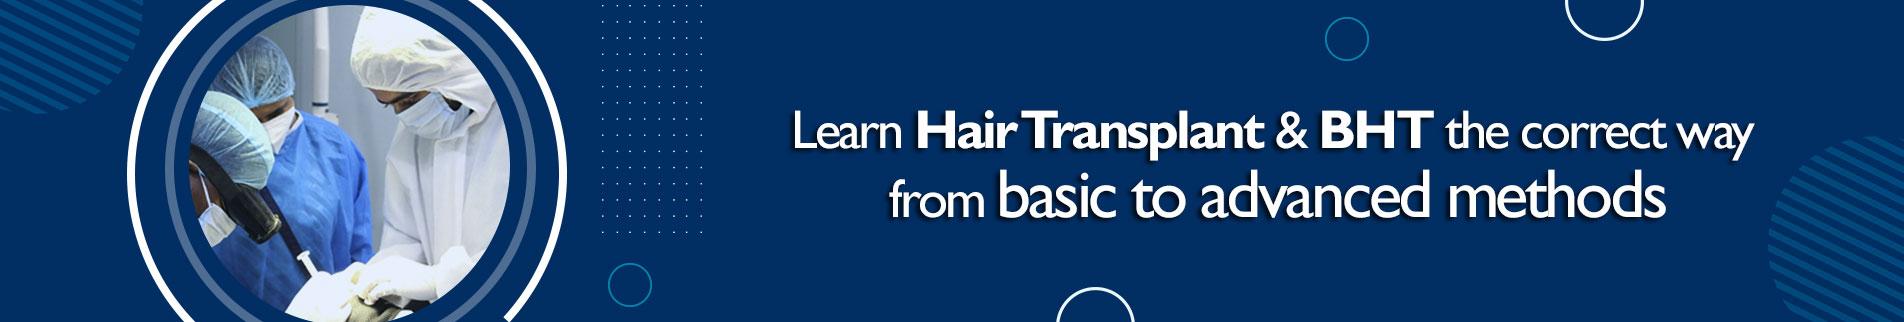 Academy of Hair Transplant